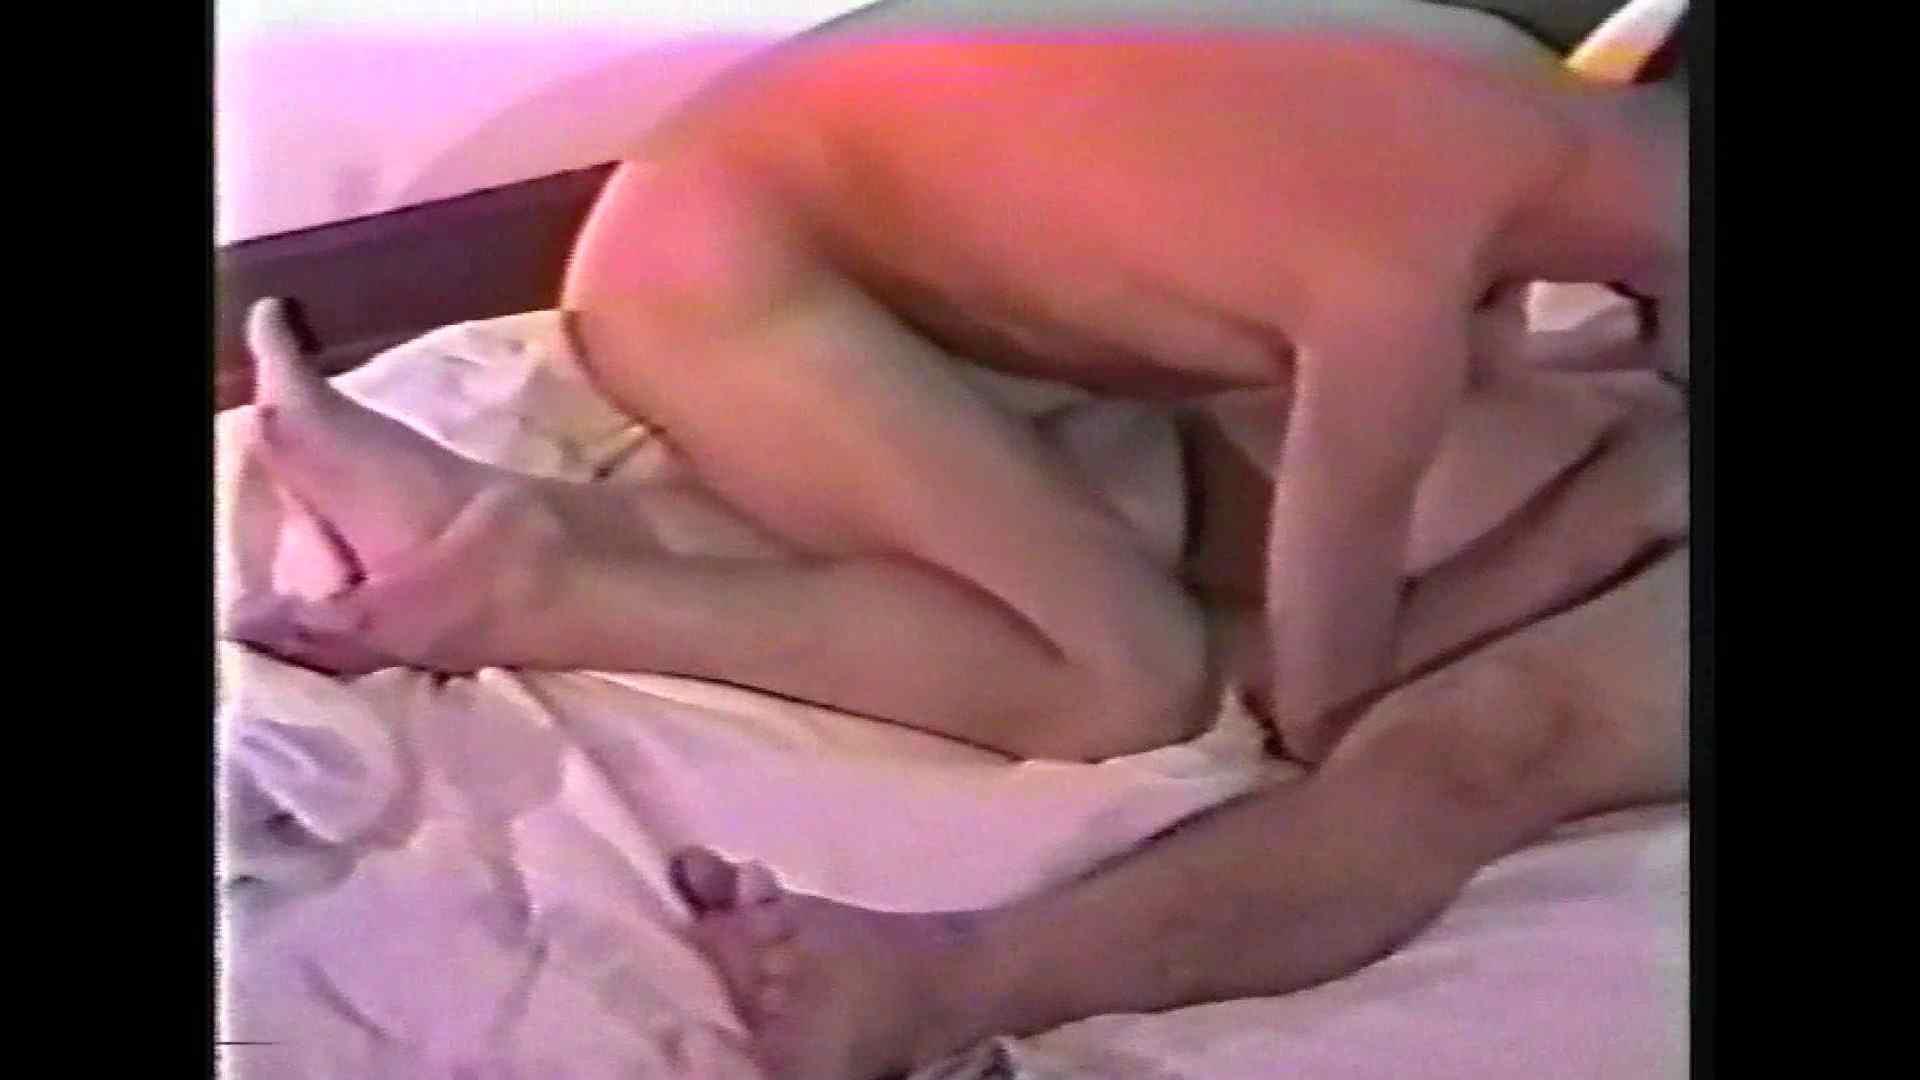 GAYBOY宏のオカズ倉庫Vol.9-2 ノンケ達のセックス   GAY  104画像 85